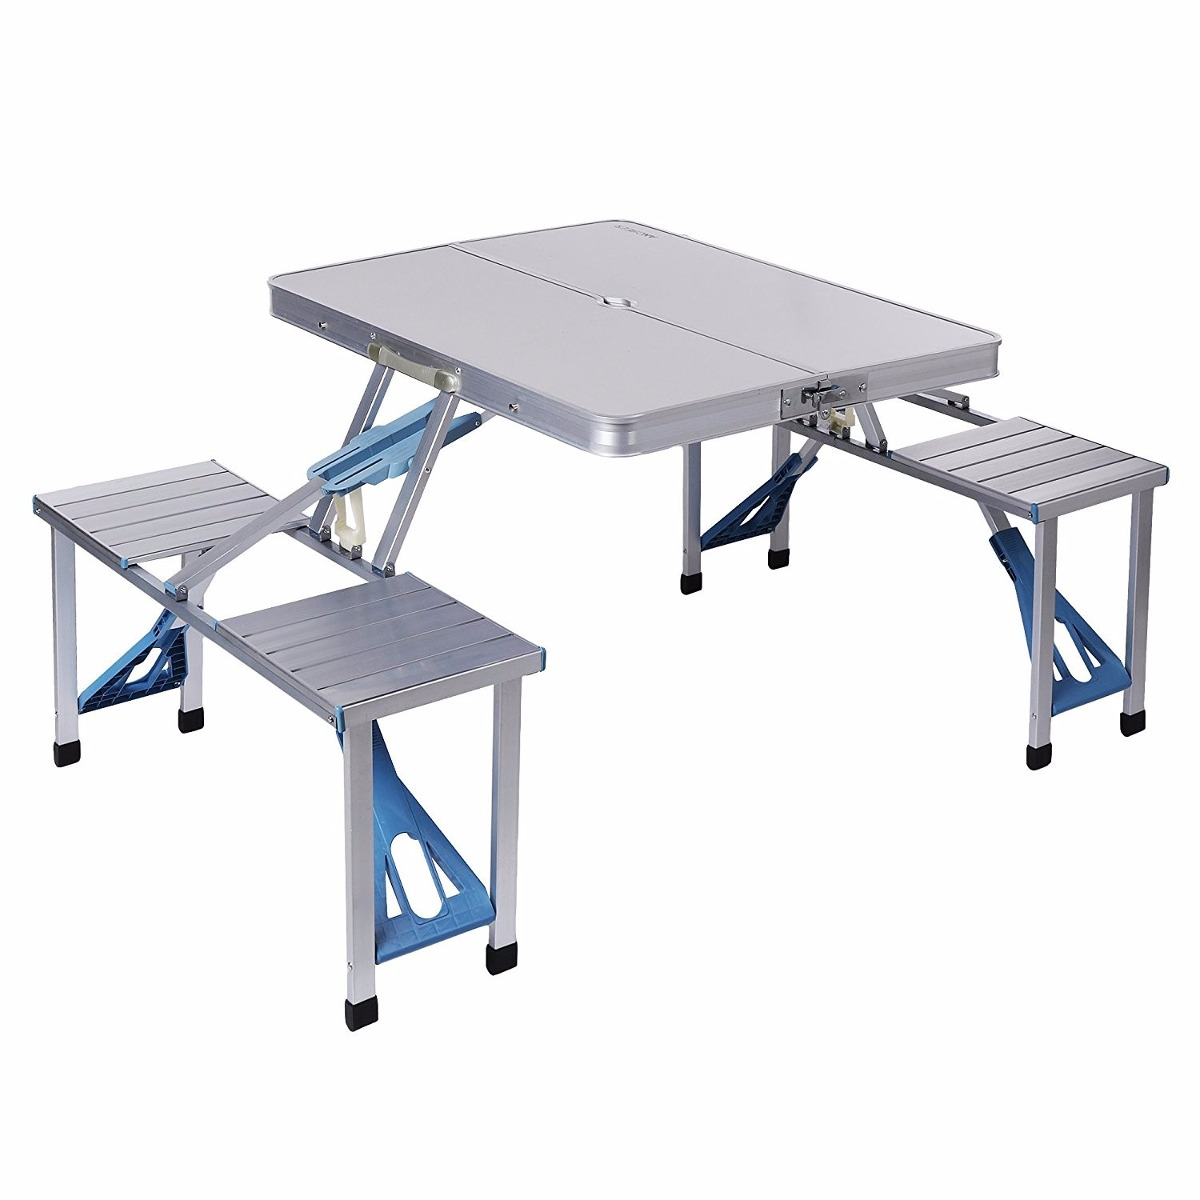 Mesa plegable ancheer aluminio tabla portable 4 asientos for Mesa plegable aluminio